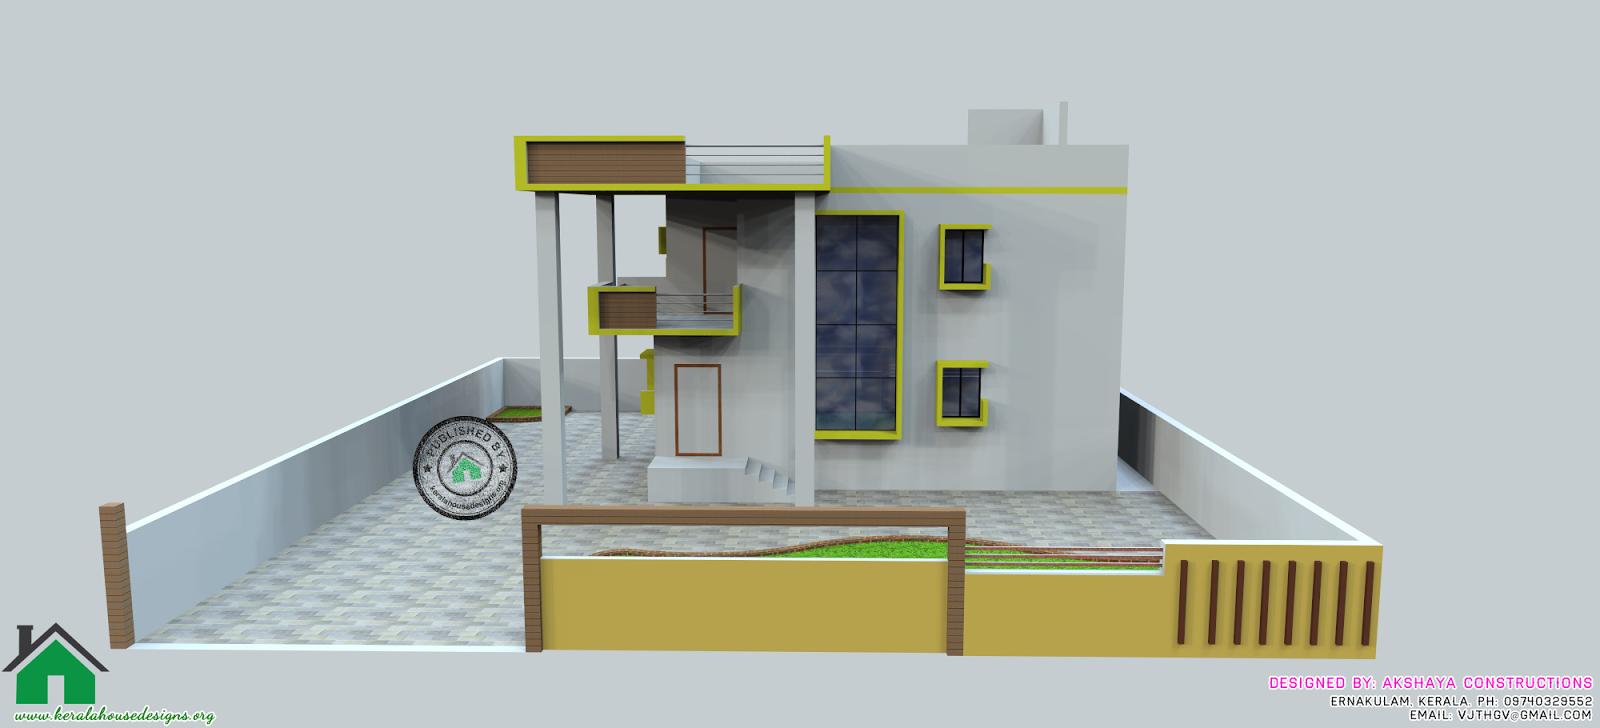 Kerala Modern House Design 3D Elevation and Floor Plan | Kerala Home ...